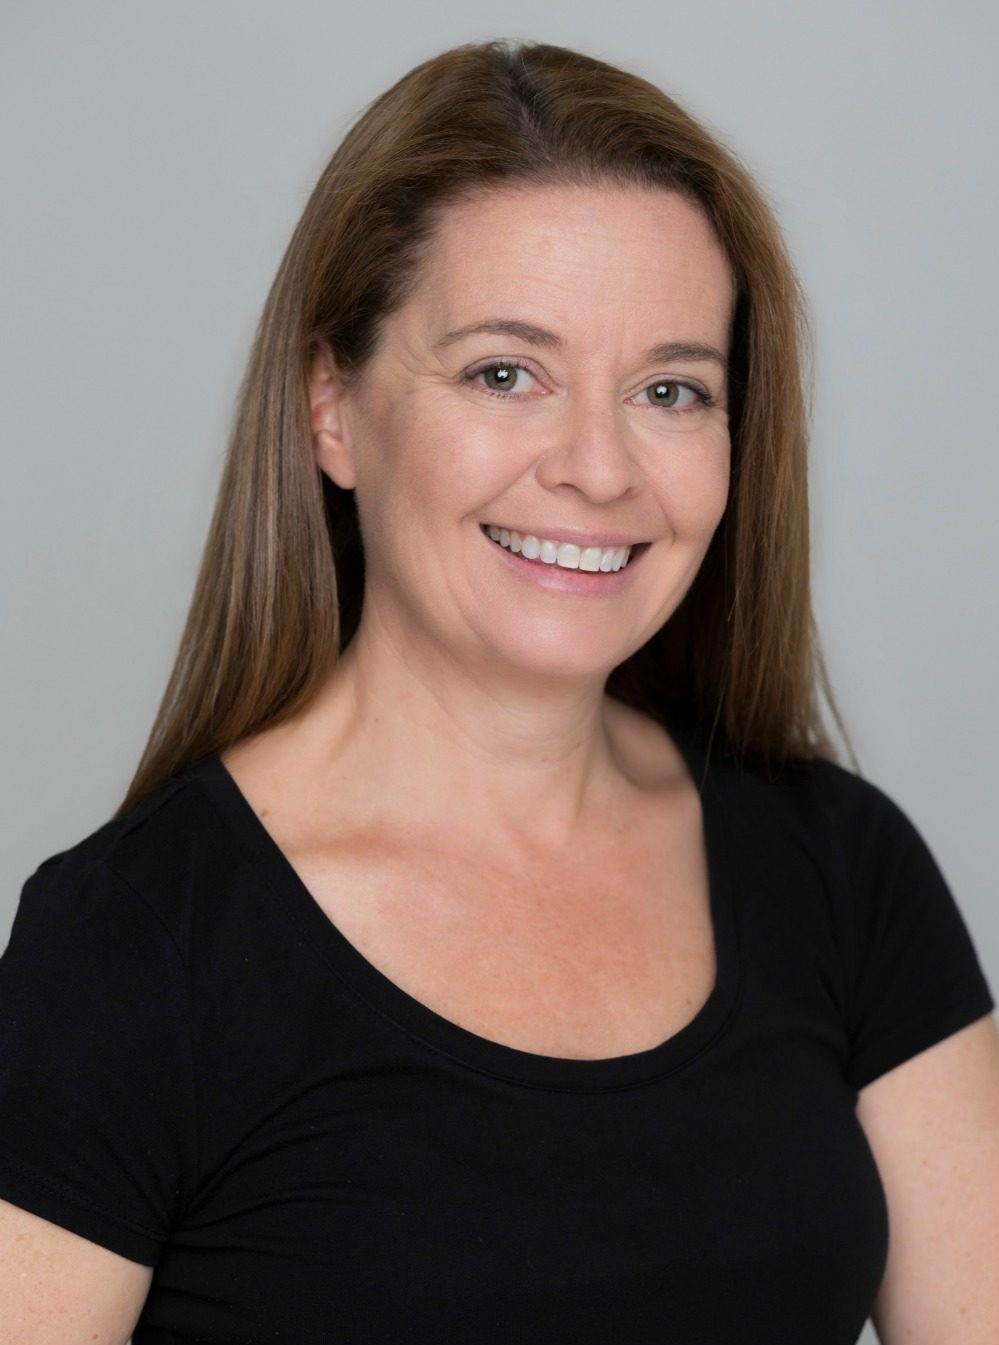 Nicole Moroney